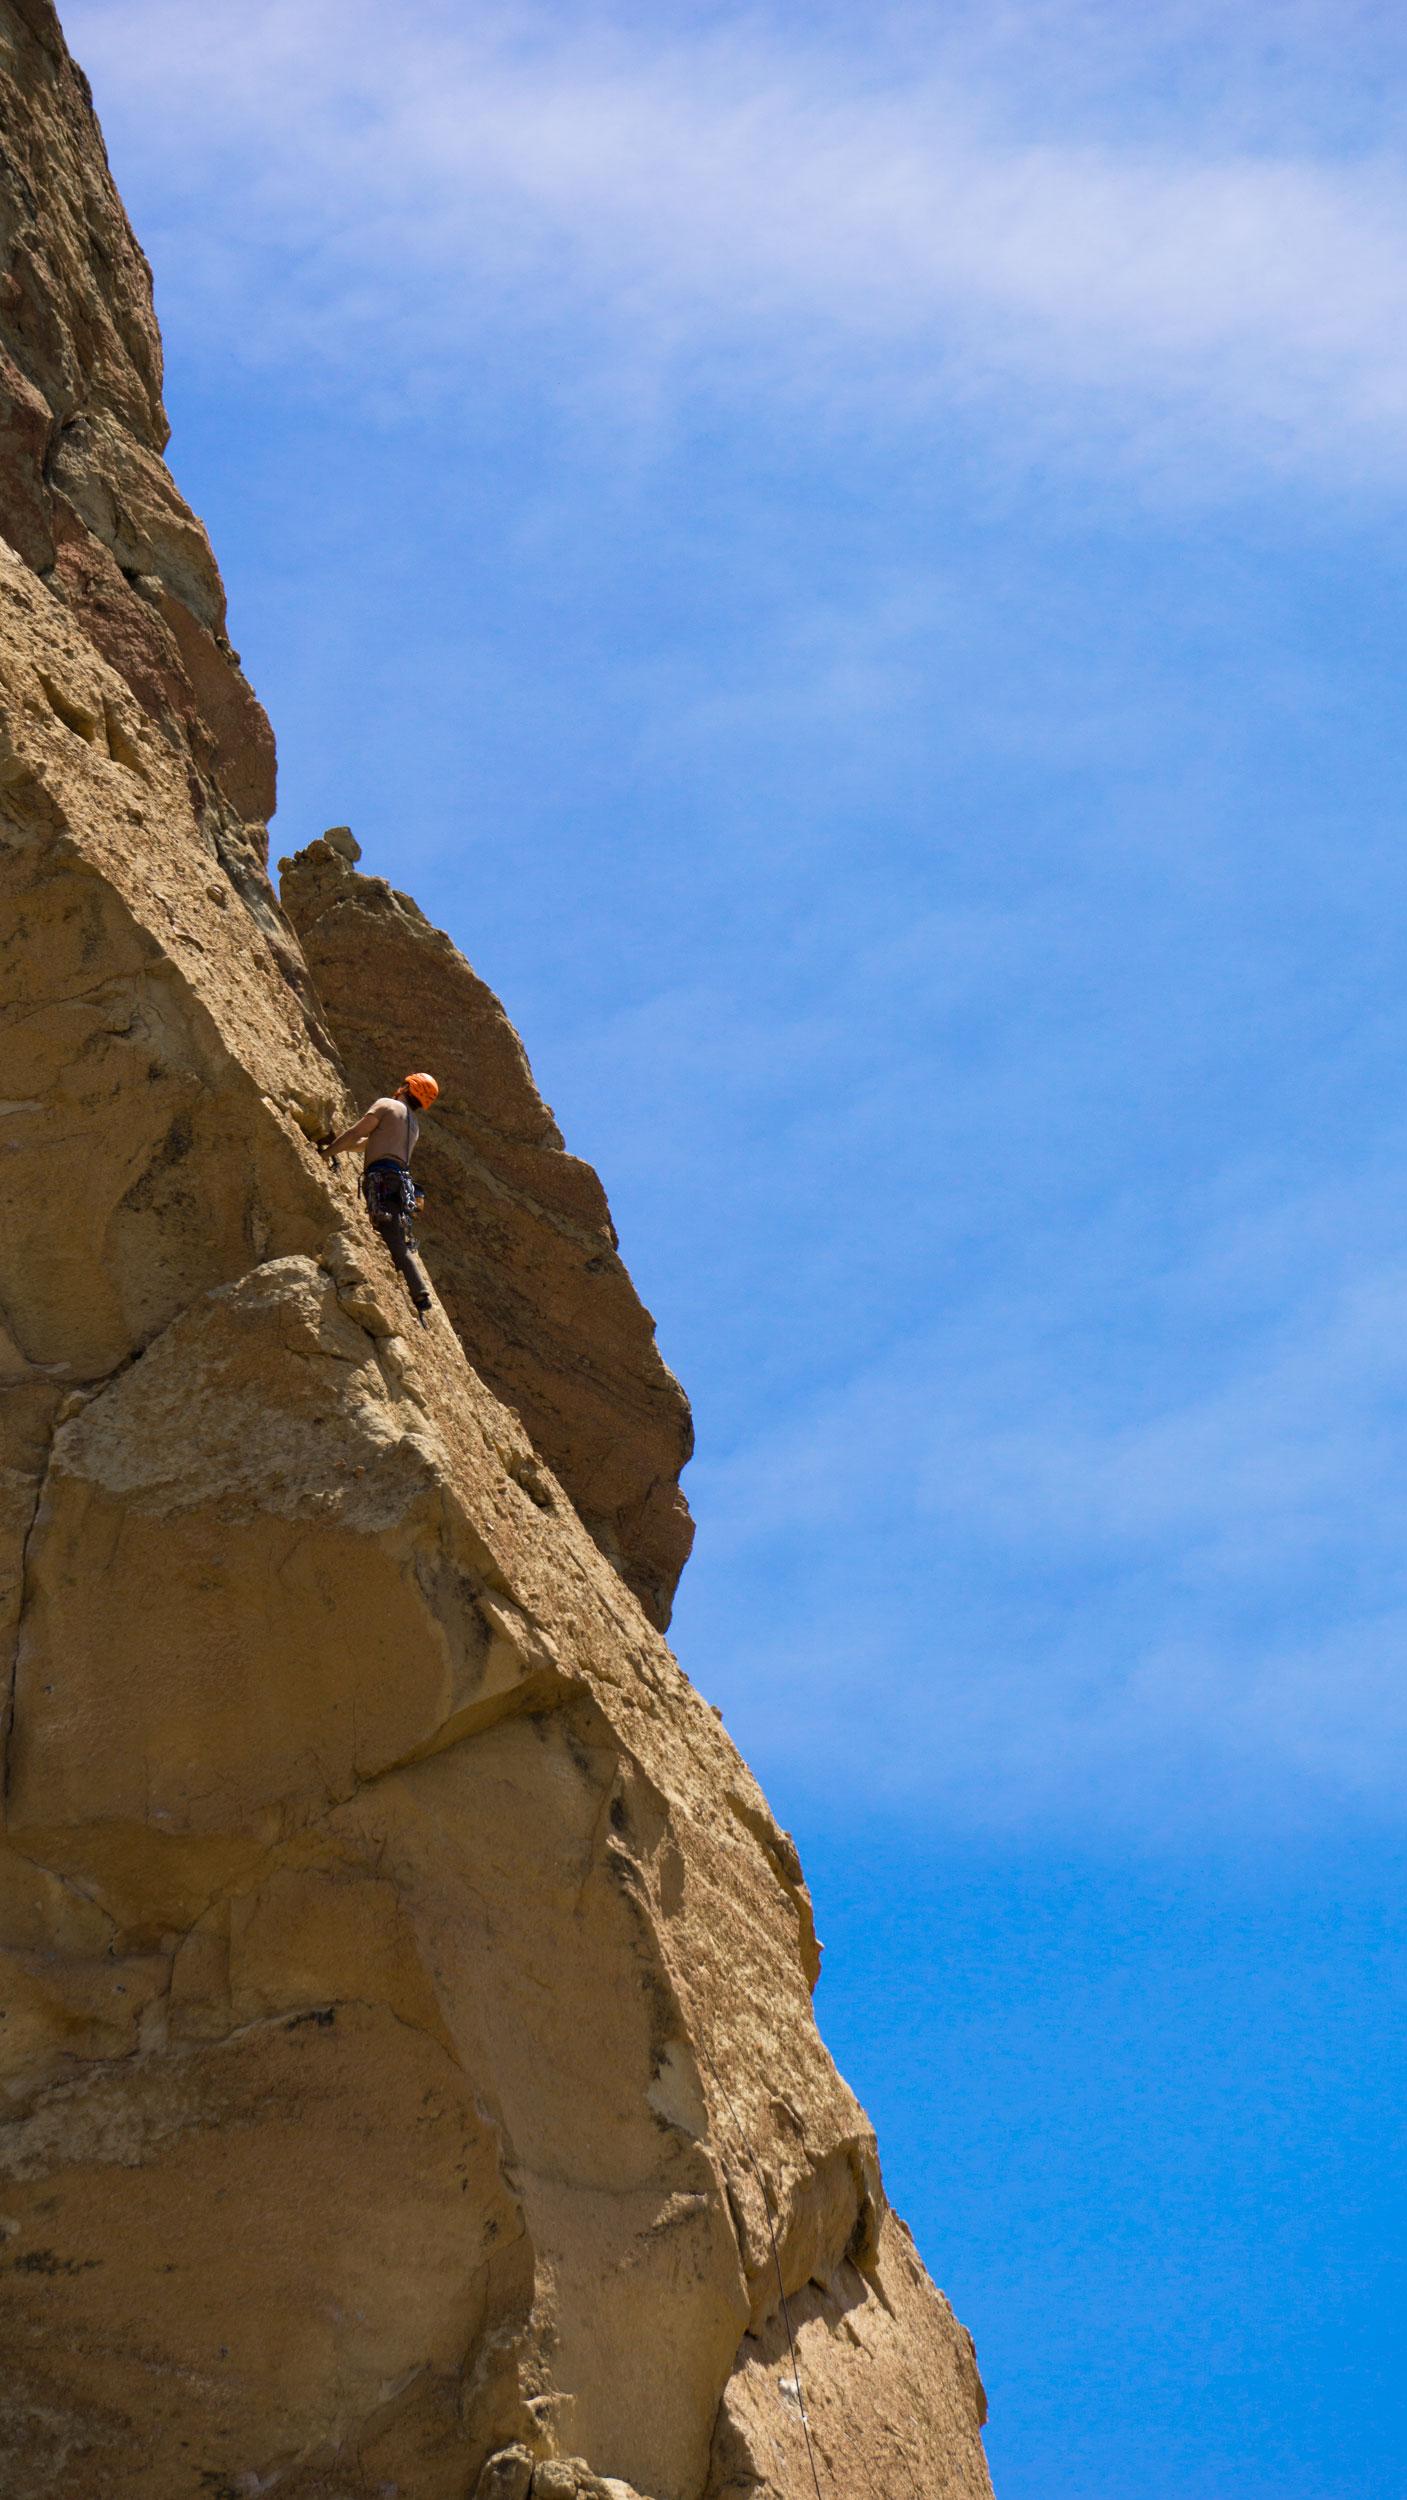 climbers on Koala Rock by Smith Rock State Park